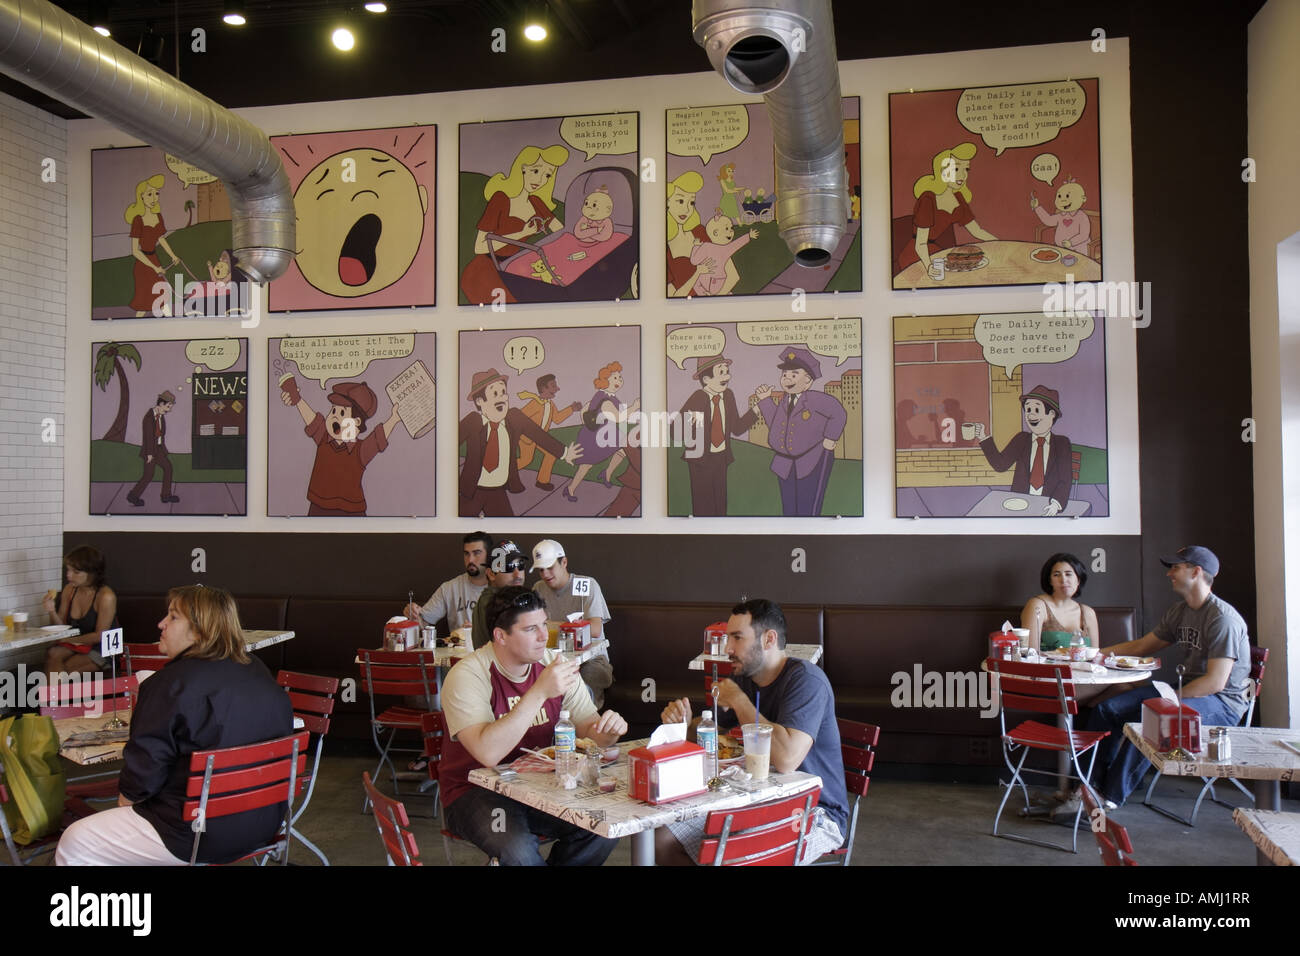 Miami Florida Biscayne Boulevard die tägliche kreative Food Company Restaurant Café Comic-Strip Wandbild Stockbild